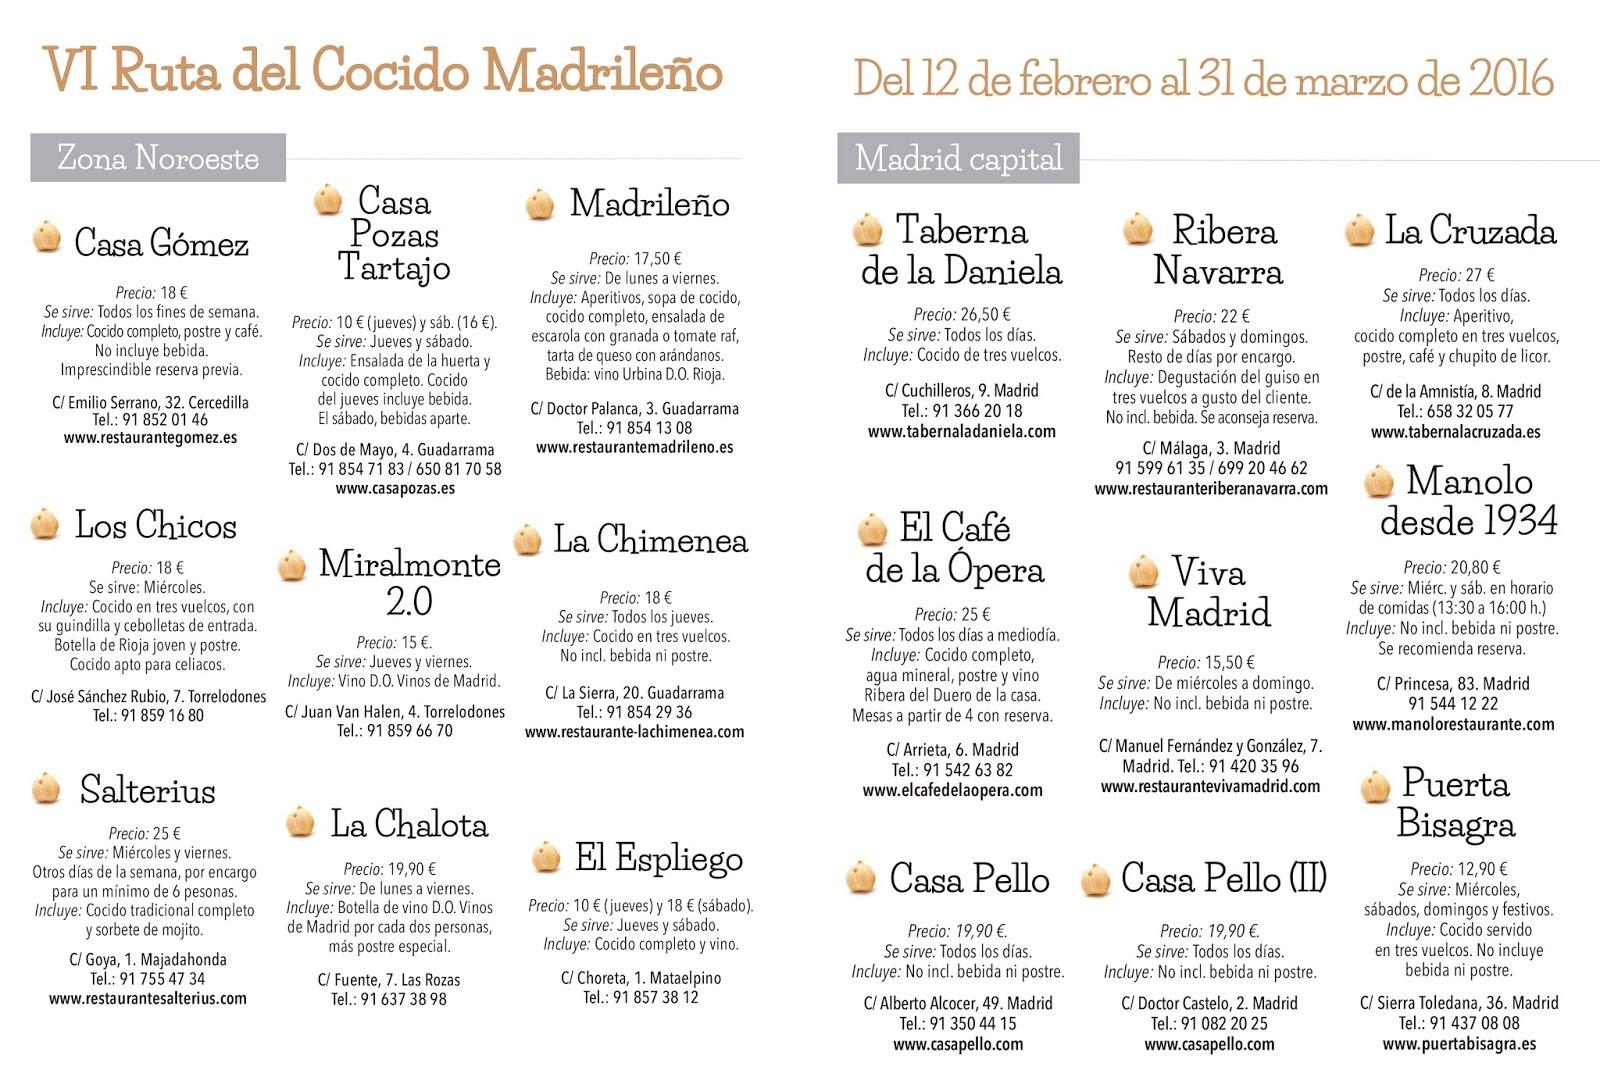 VI Ruta del Cocido Madrileño